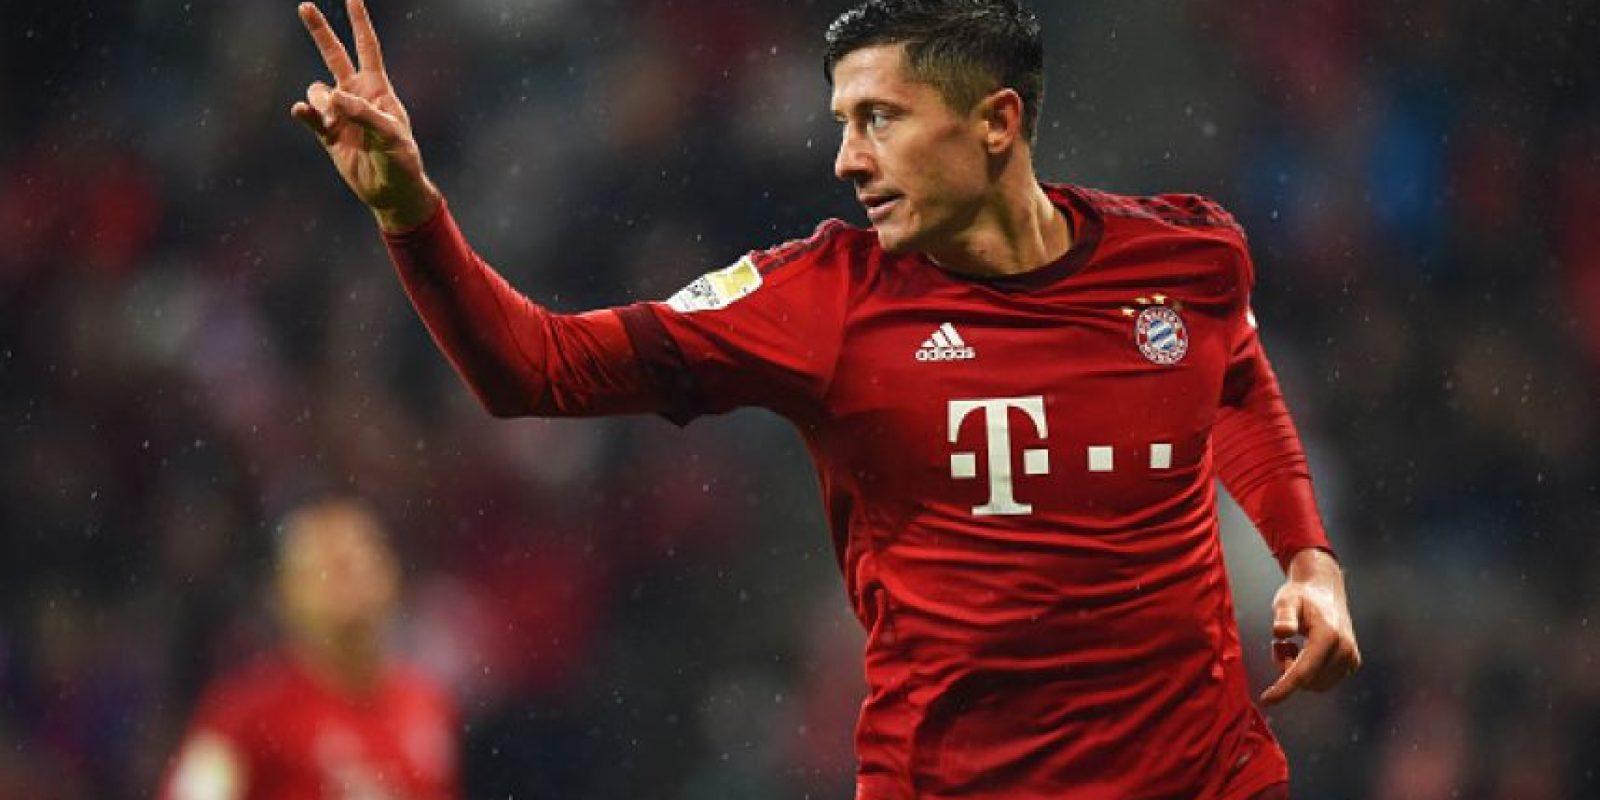 9. Robert Lewandowski / 70 millones de euros Foto:Getty Images